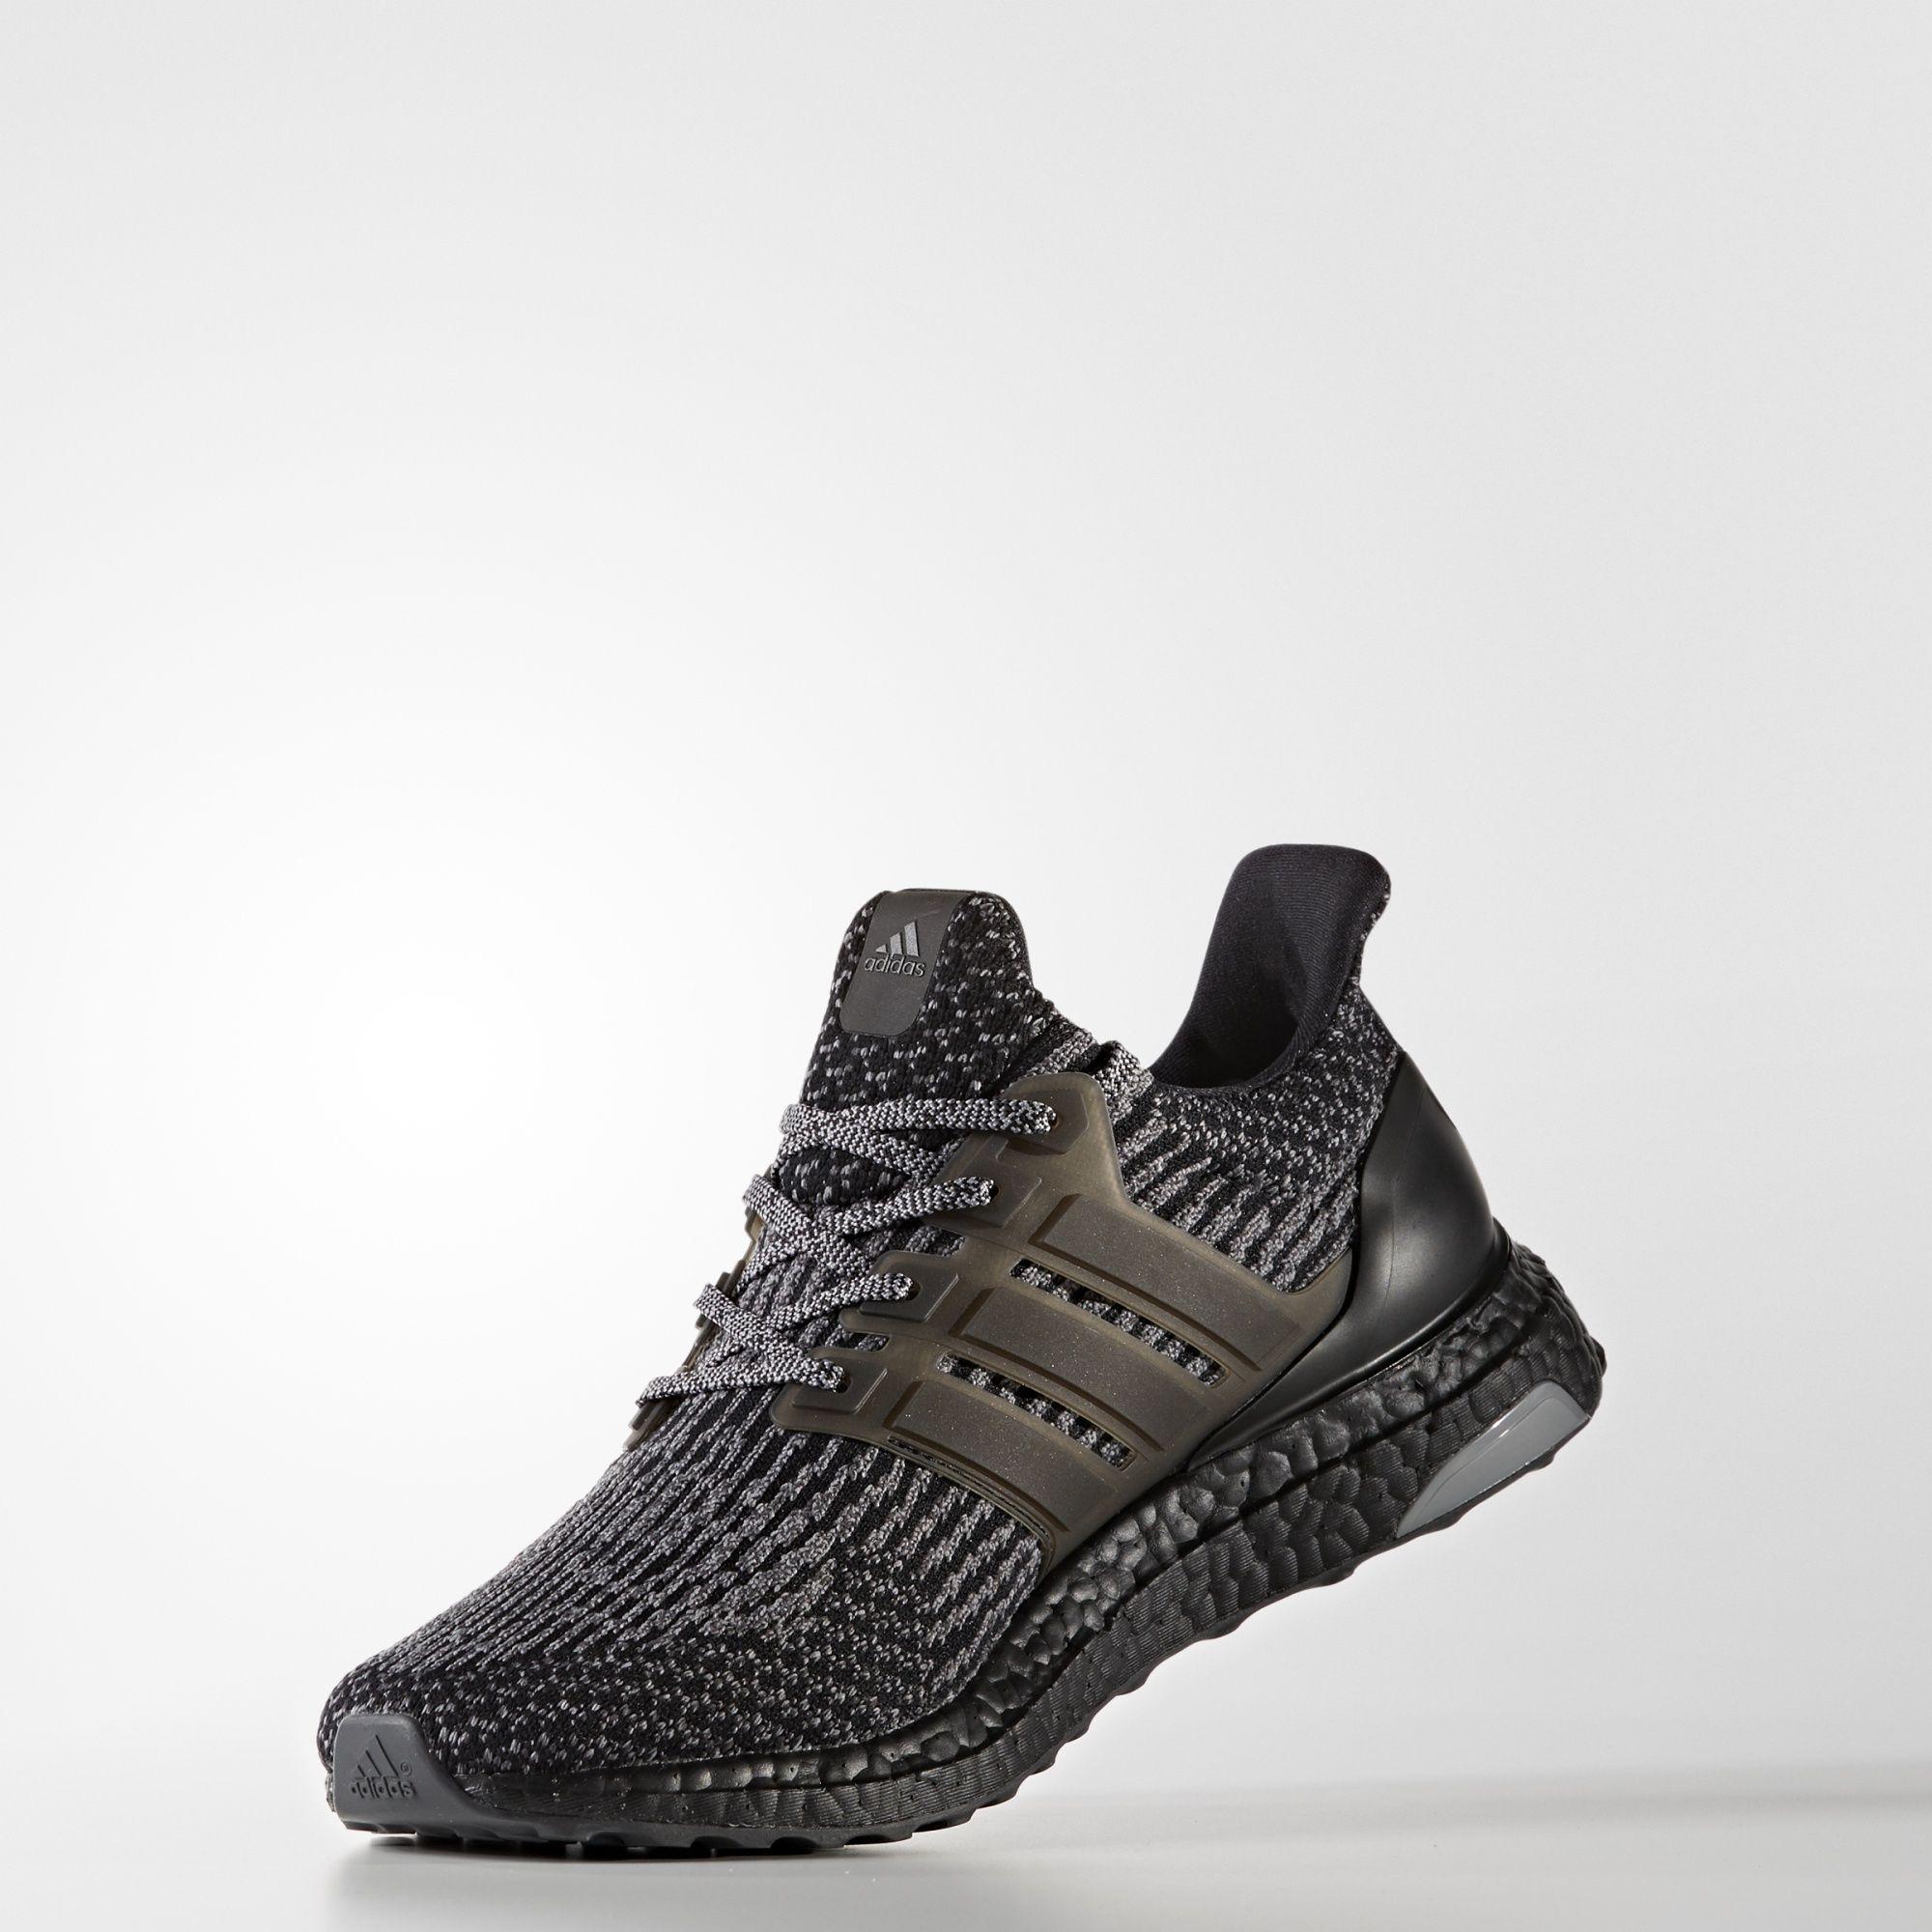 a2f711f2d90 australia adidas ultra boost black and grey 3.0 0116d 45554